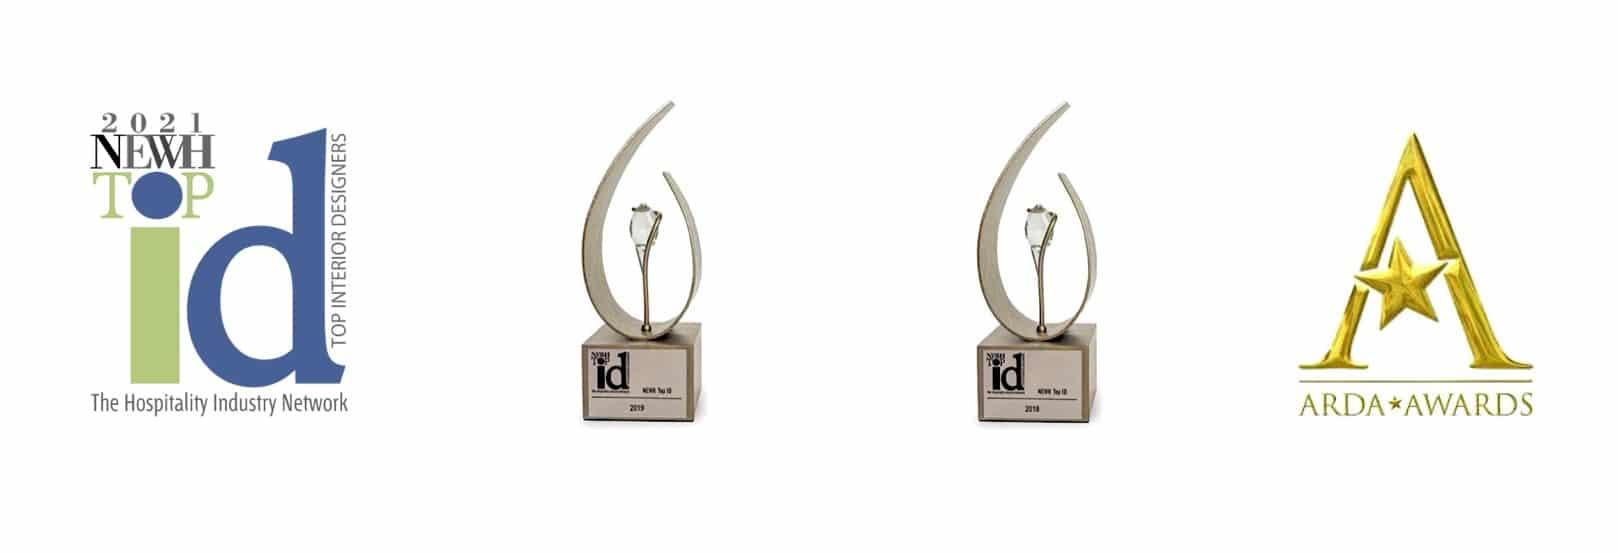 newh top id hospitality design award winner 2021